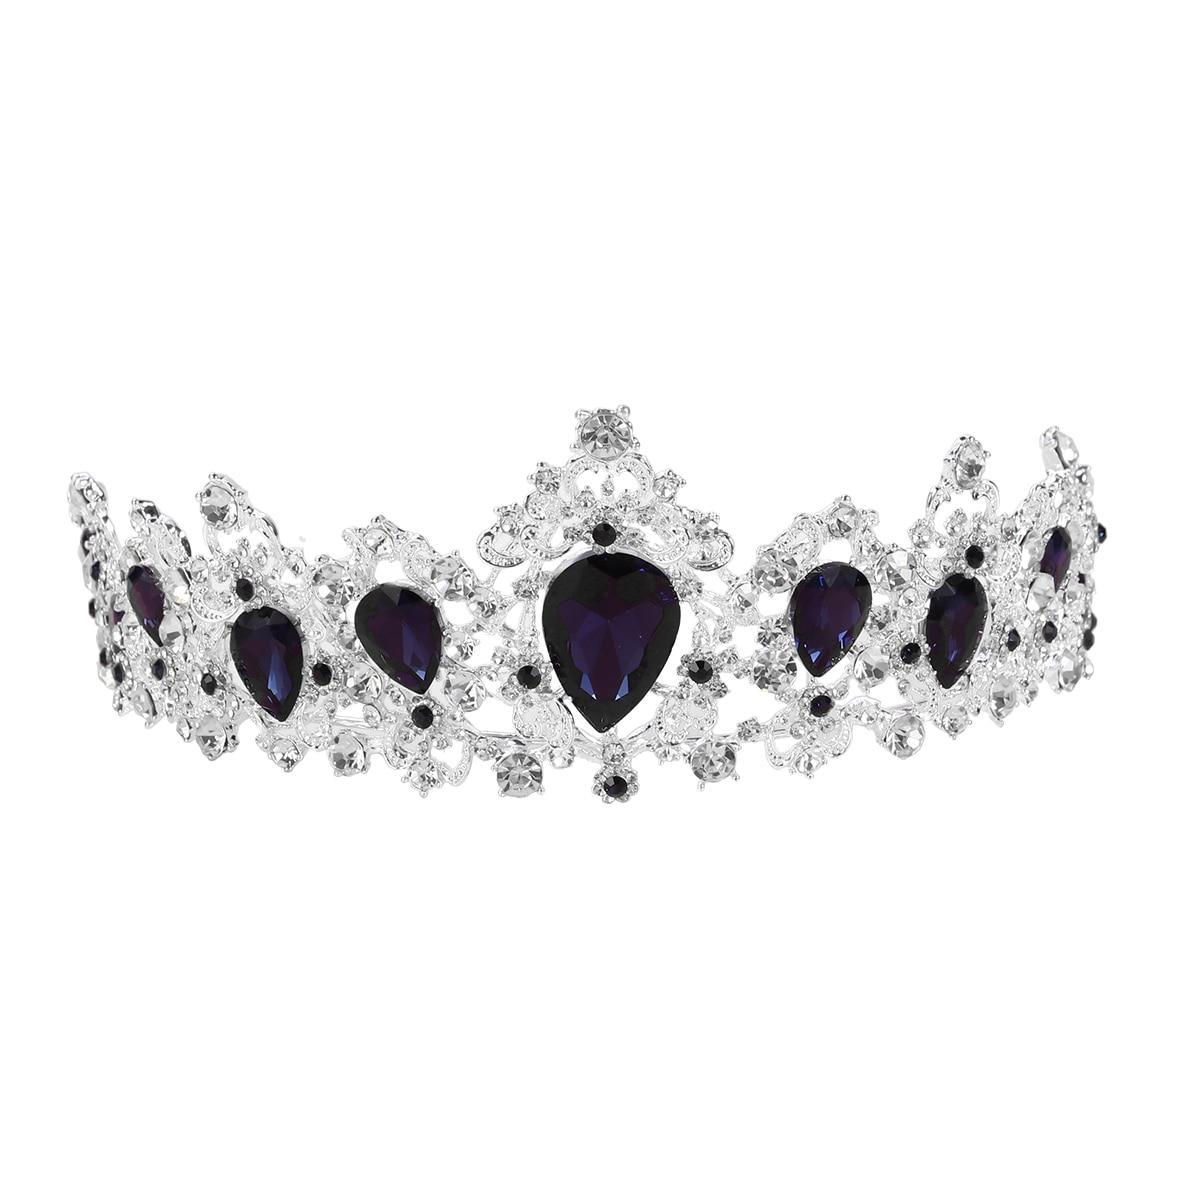 Tiara de brillantes de aleación de corona Vintage barroca, diadema nupcial, accesorio para el cabello, tocado de Boda (azul oscuro)